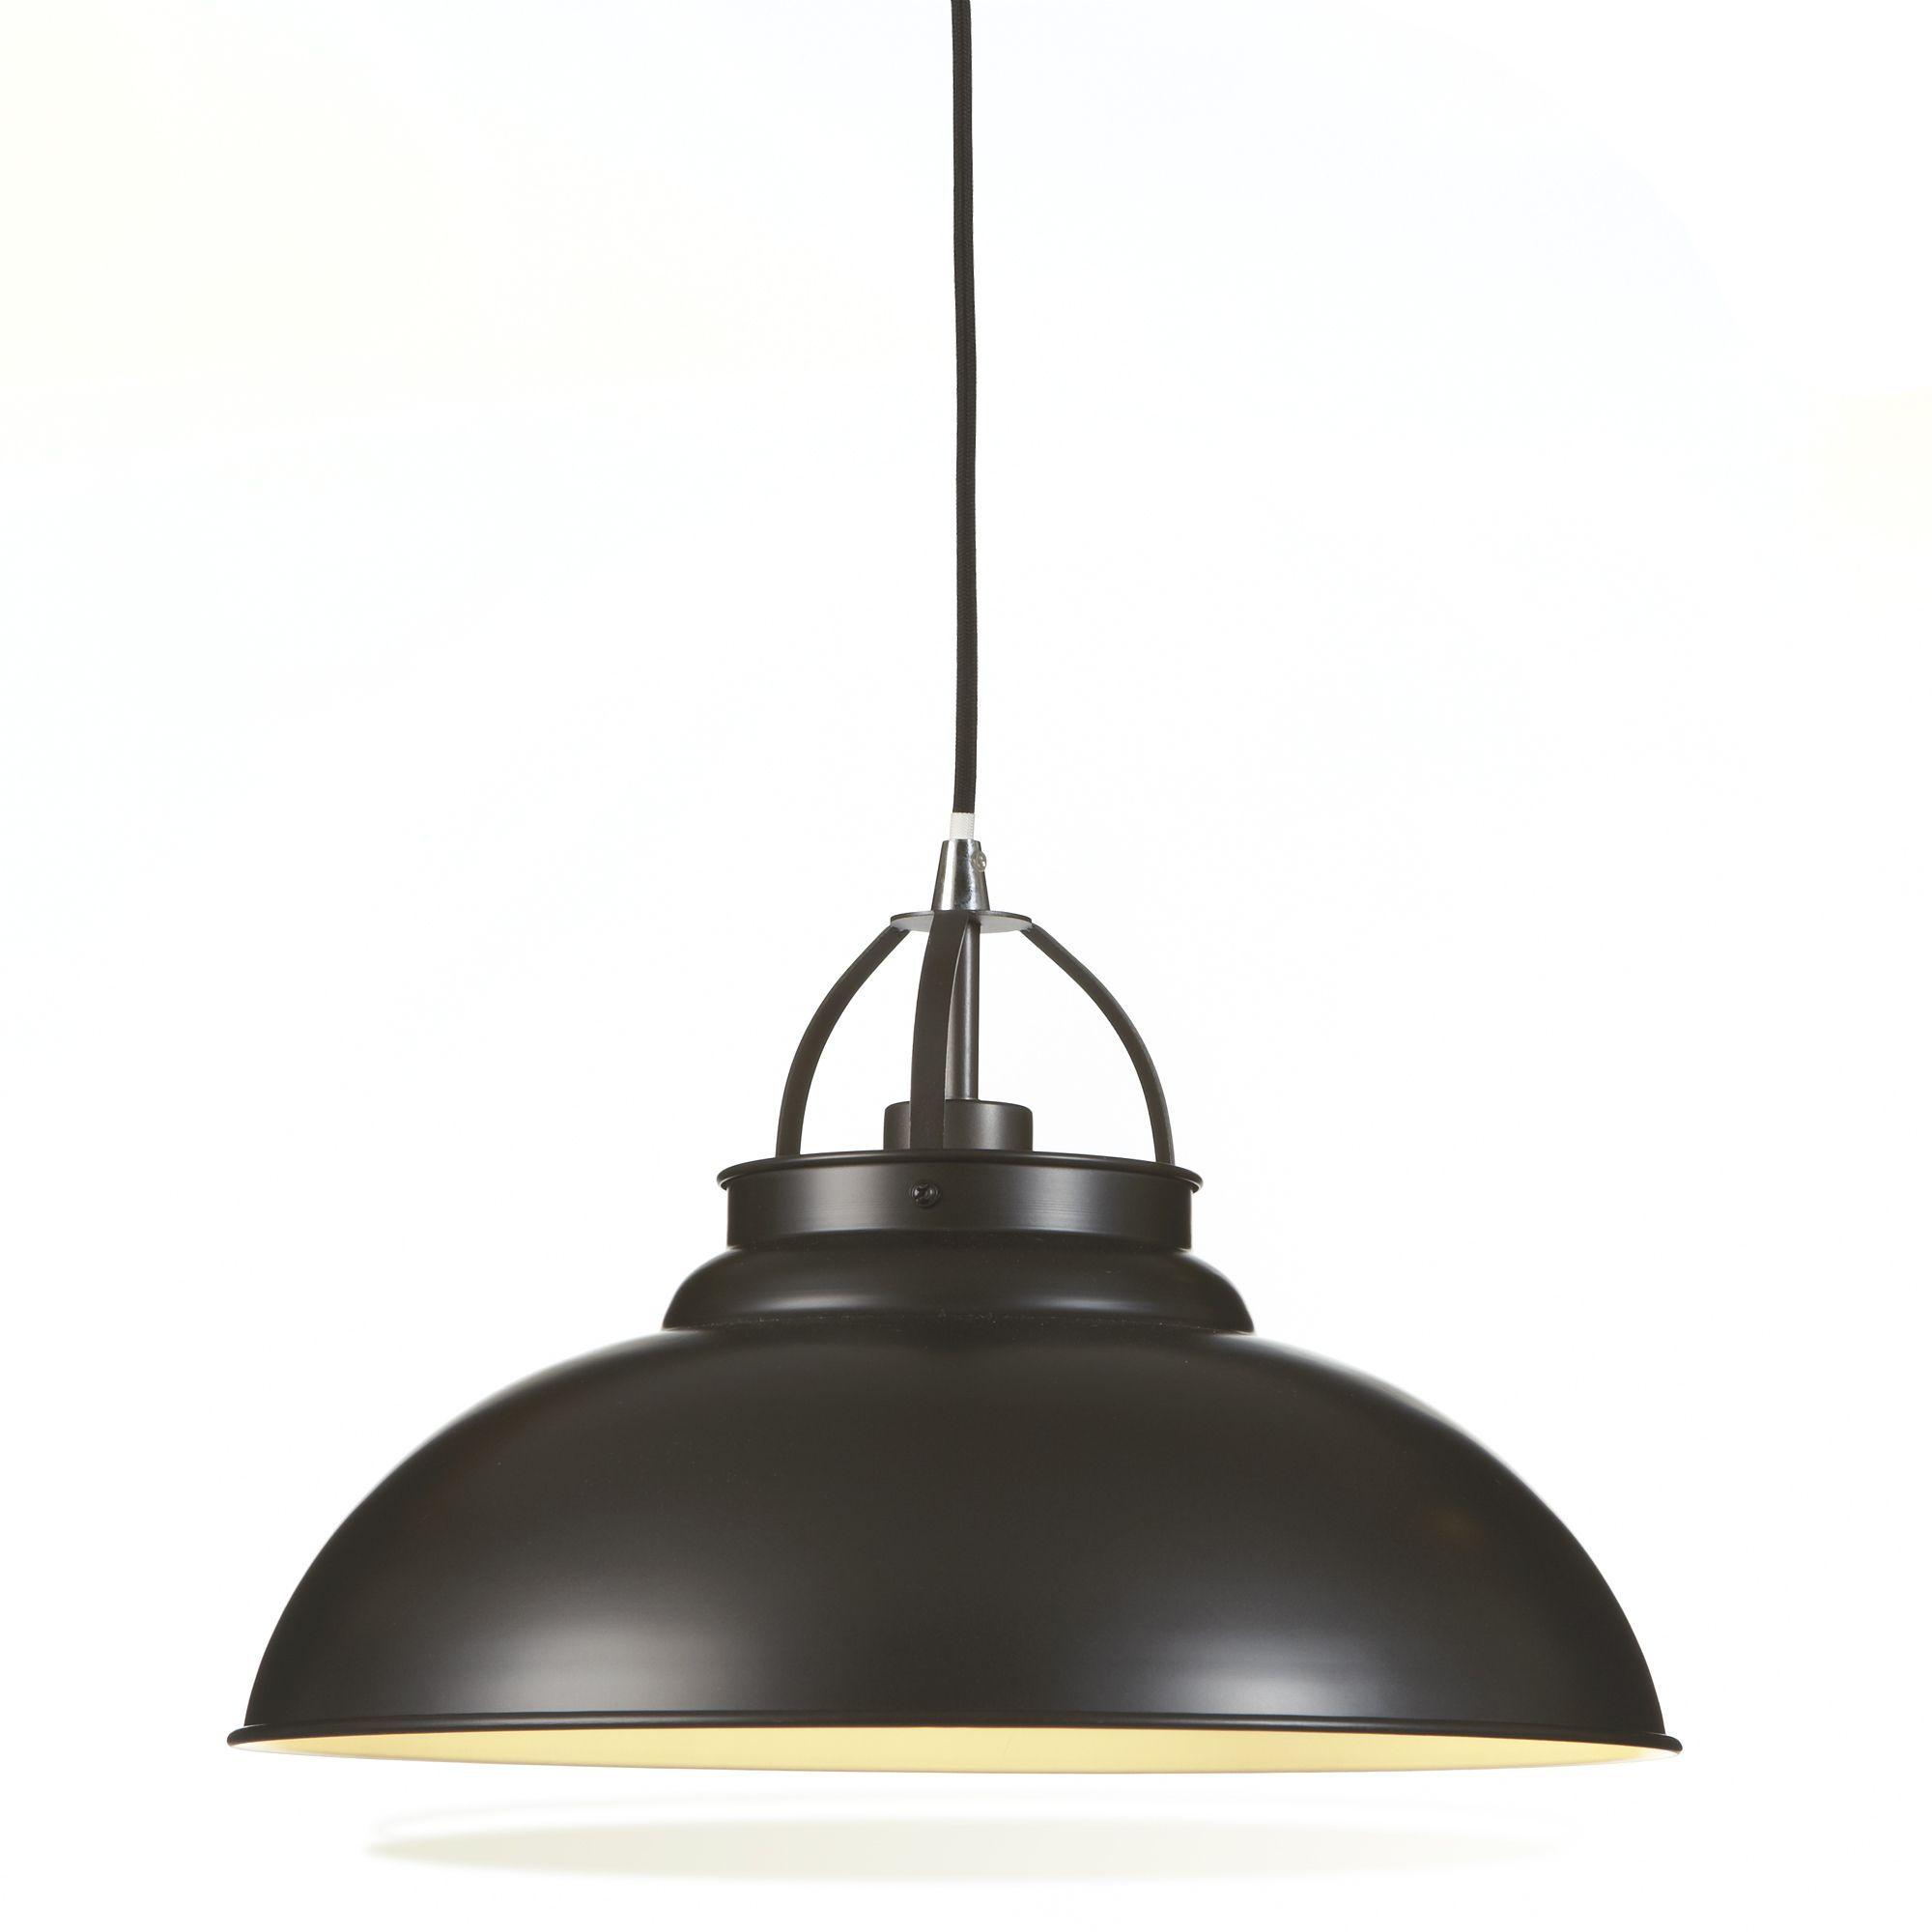 suspension 1 lumi re gris hamois les suspensions. Black Bedroom Furniture Sets. Home Design Ideas